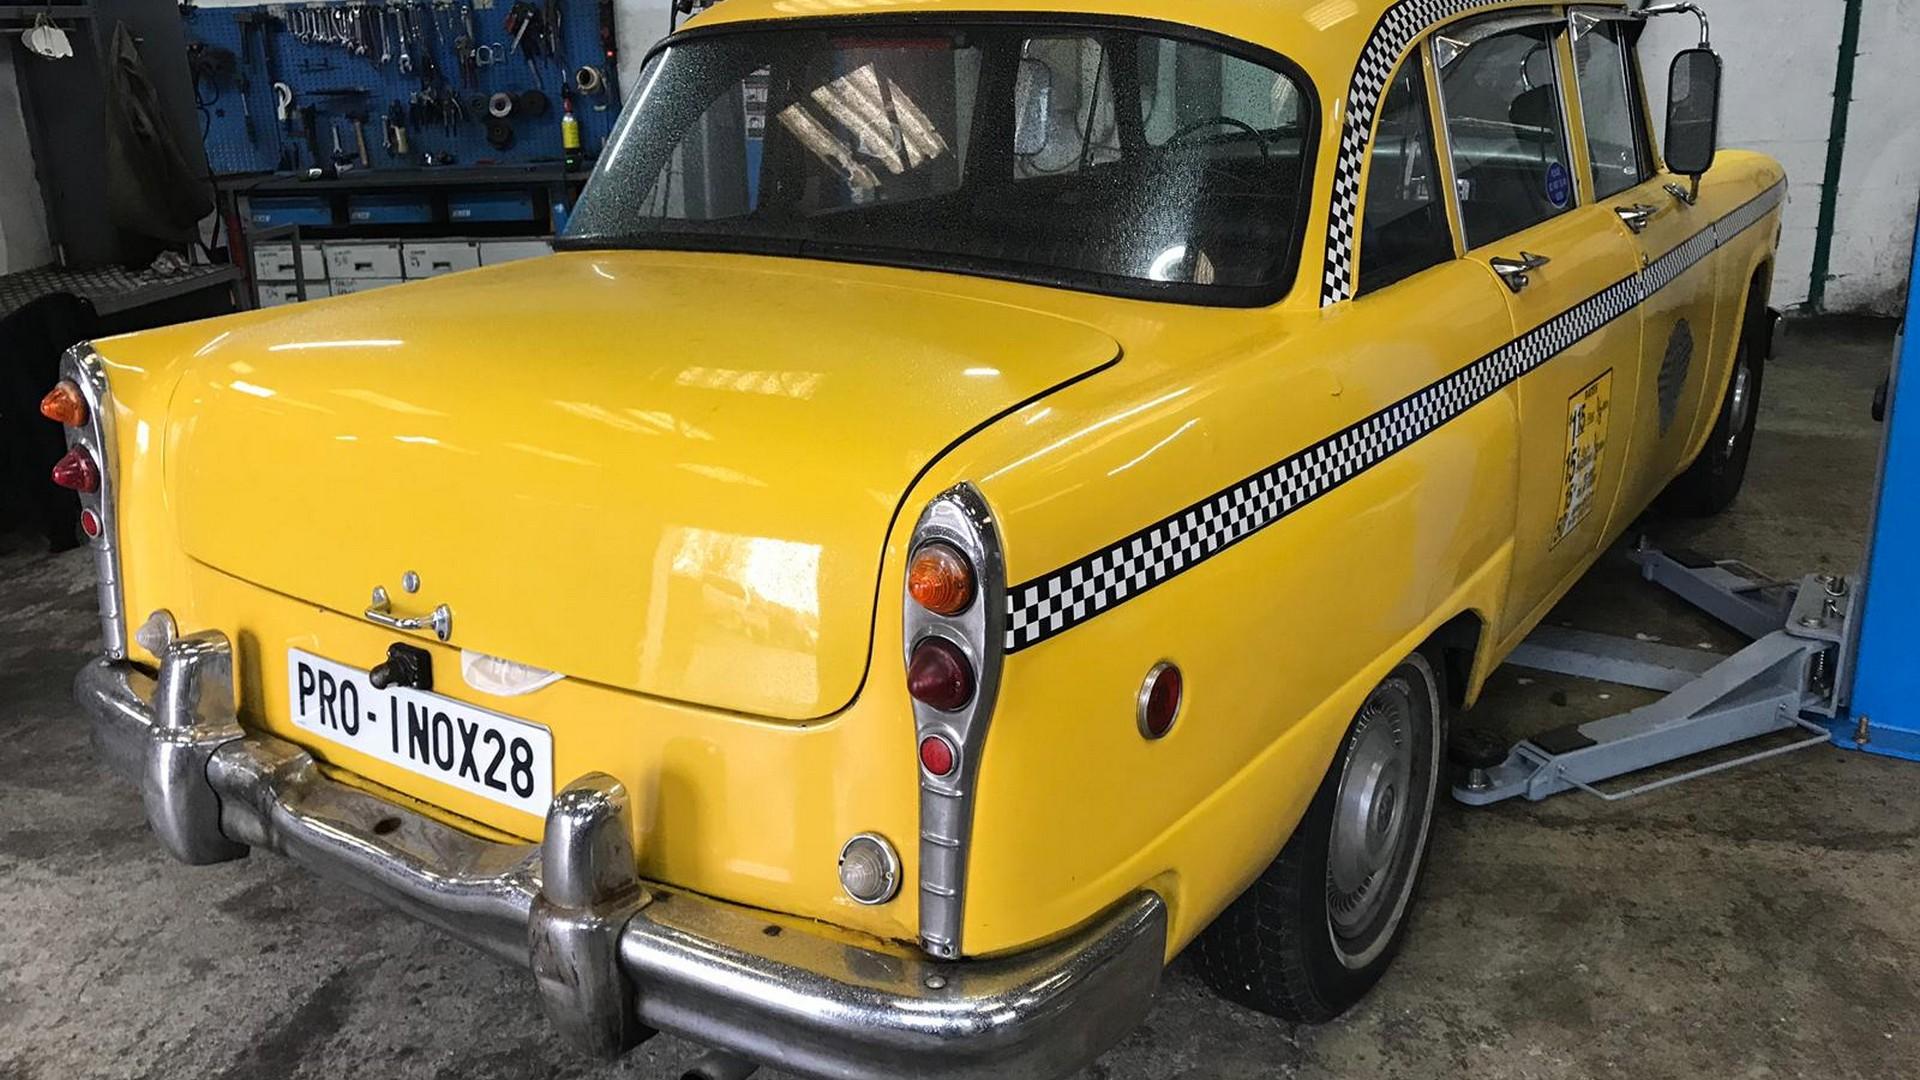 Proinox28- Échappement Checker Taxi New York